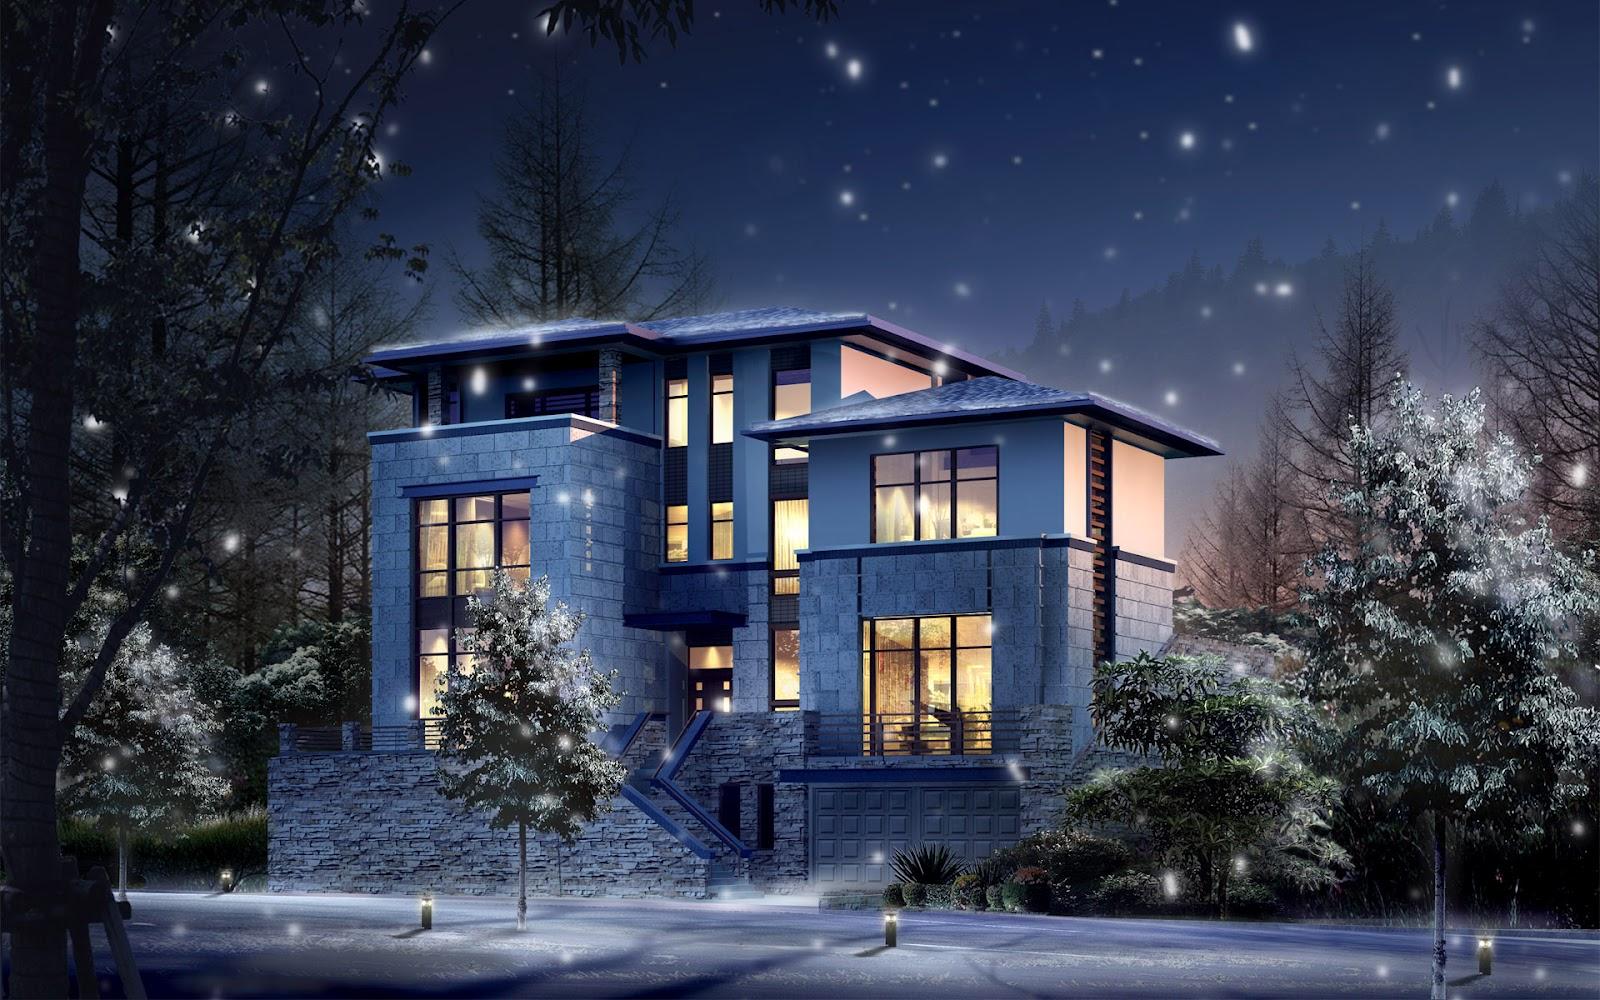 3d huizen wallpapers hd wallpapers. Black Bedroom Furniture Sets. Home Design Ideas